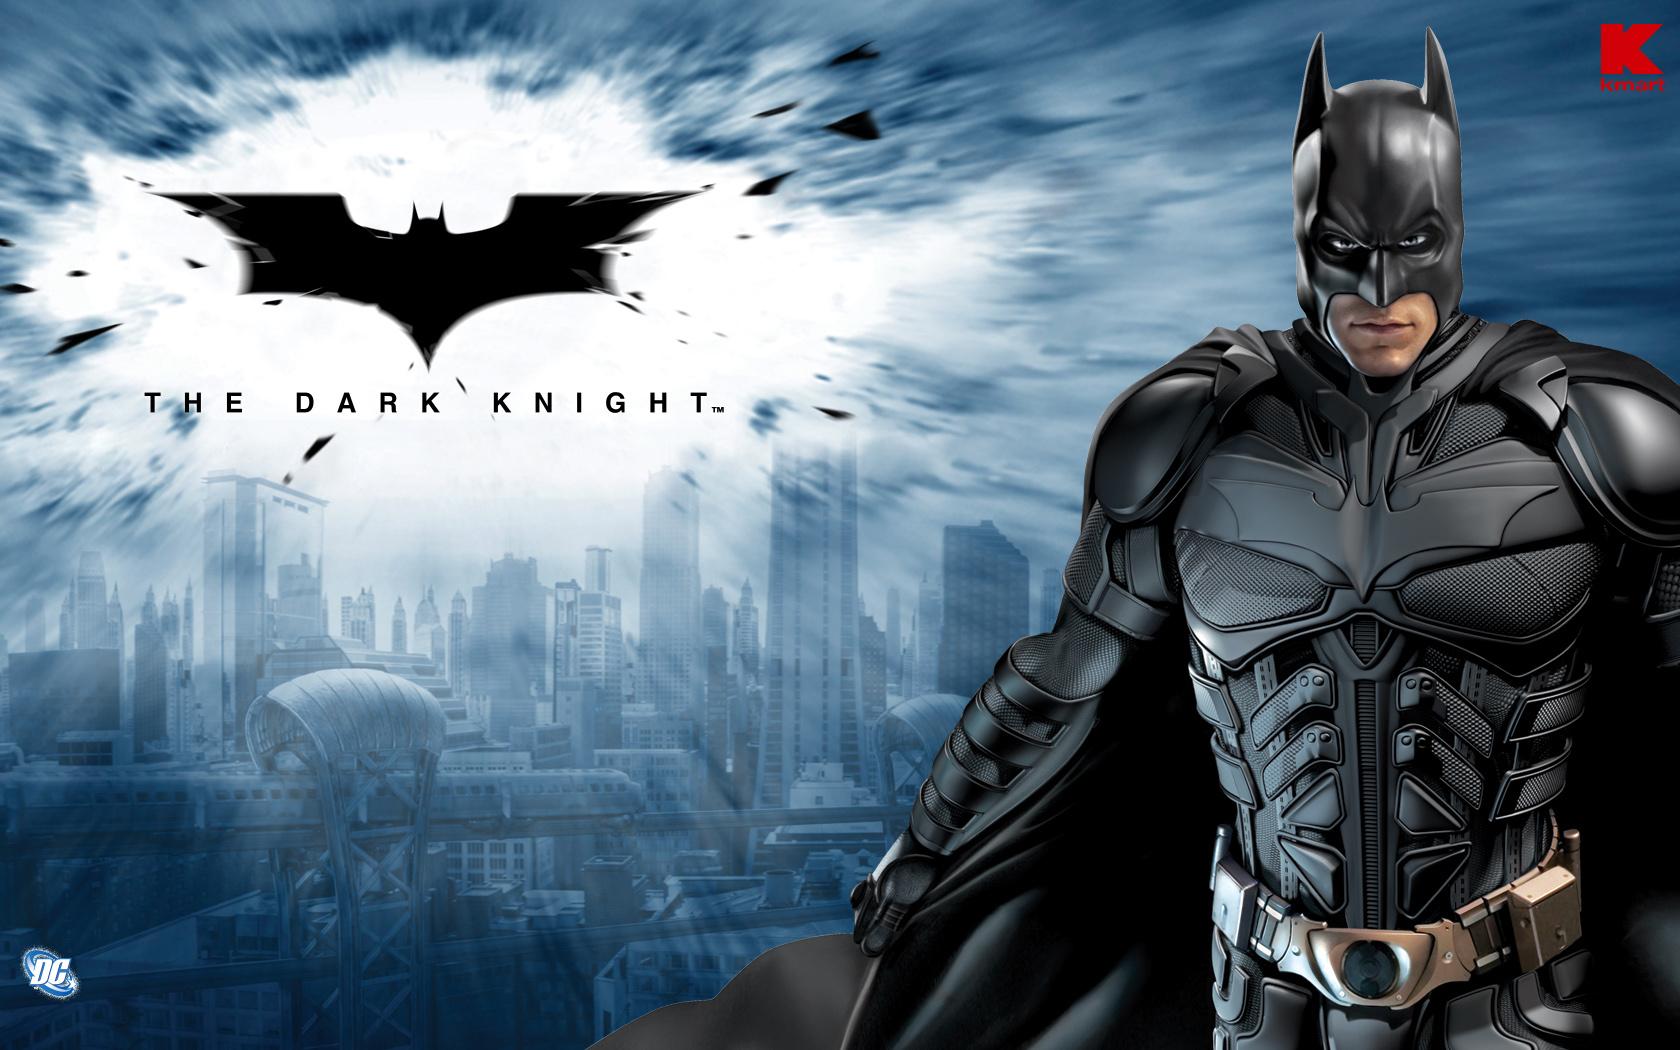 Batman HD Wallpaper 2013 HD Wallpapers 1680x1050